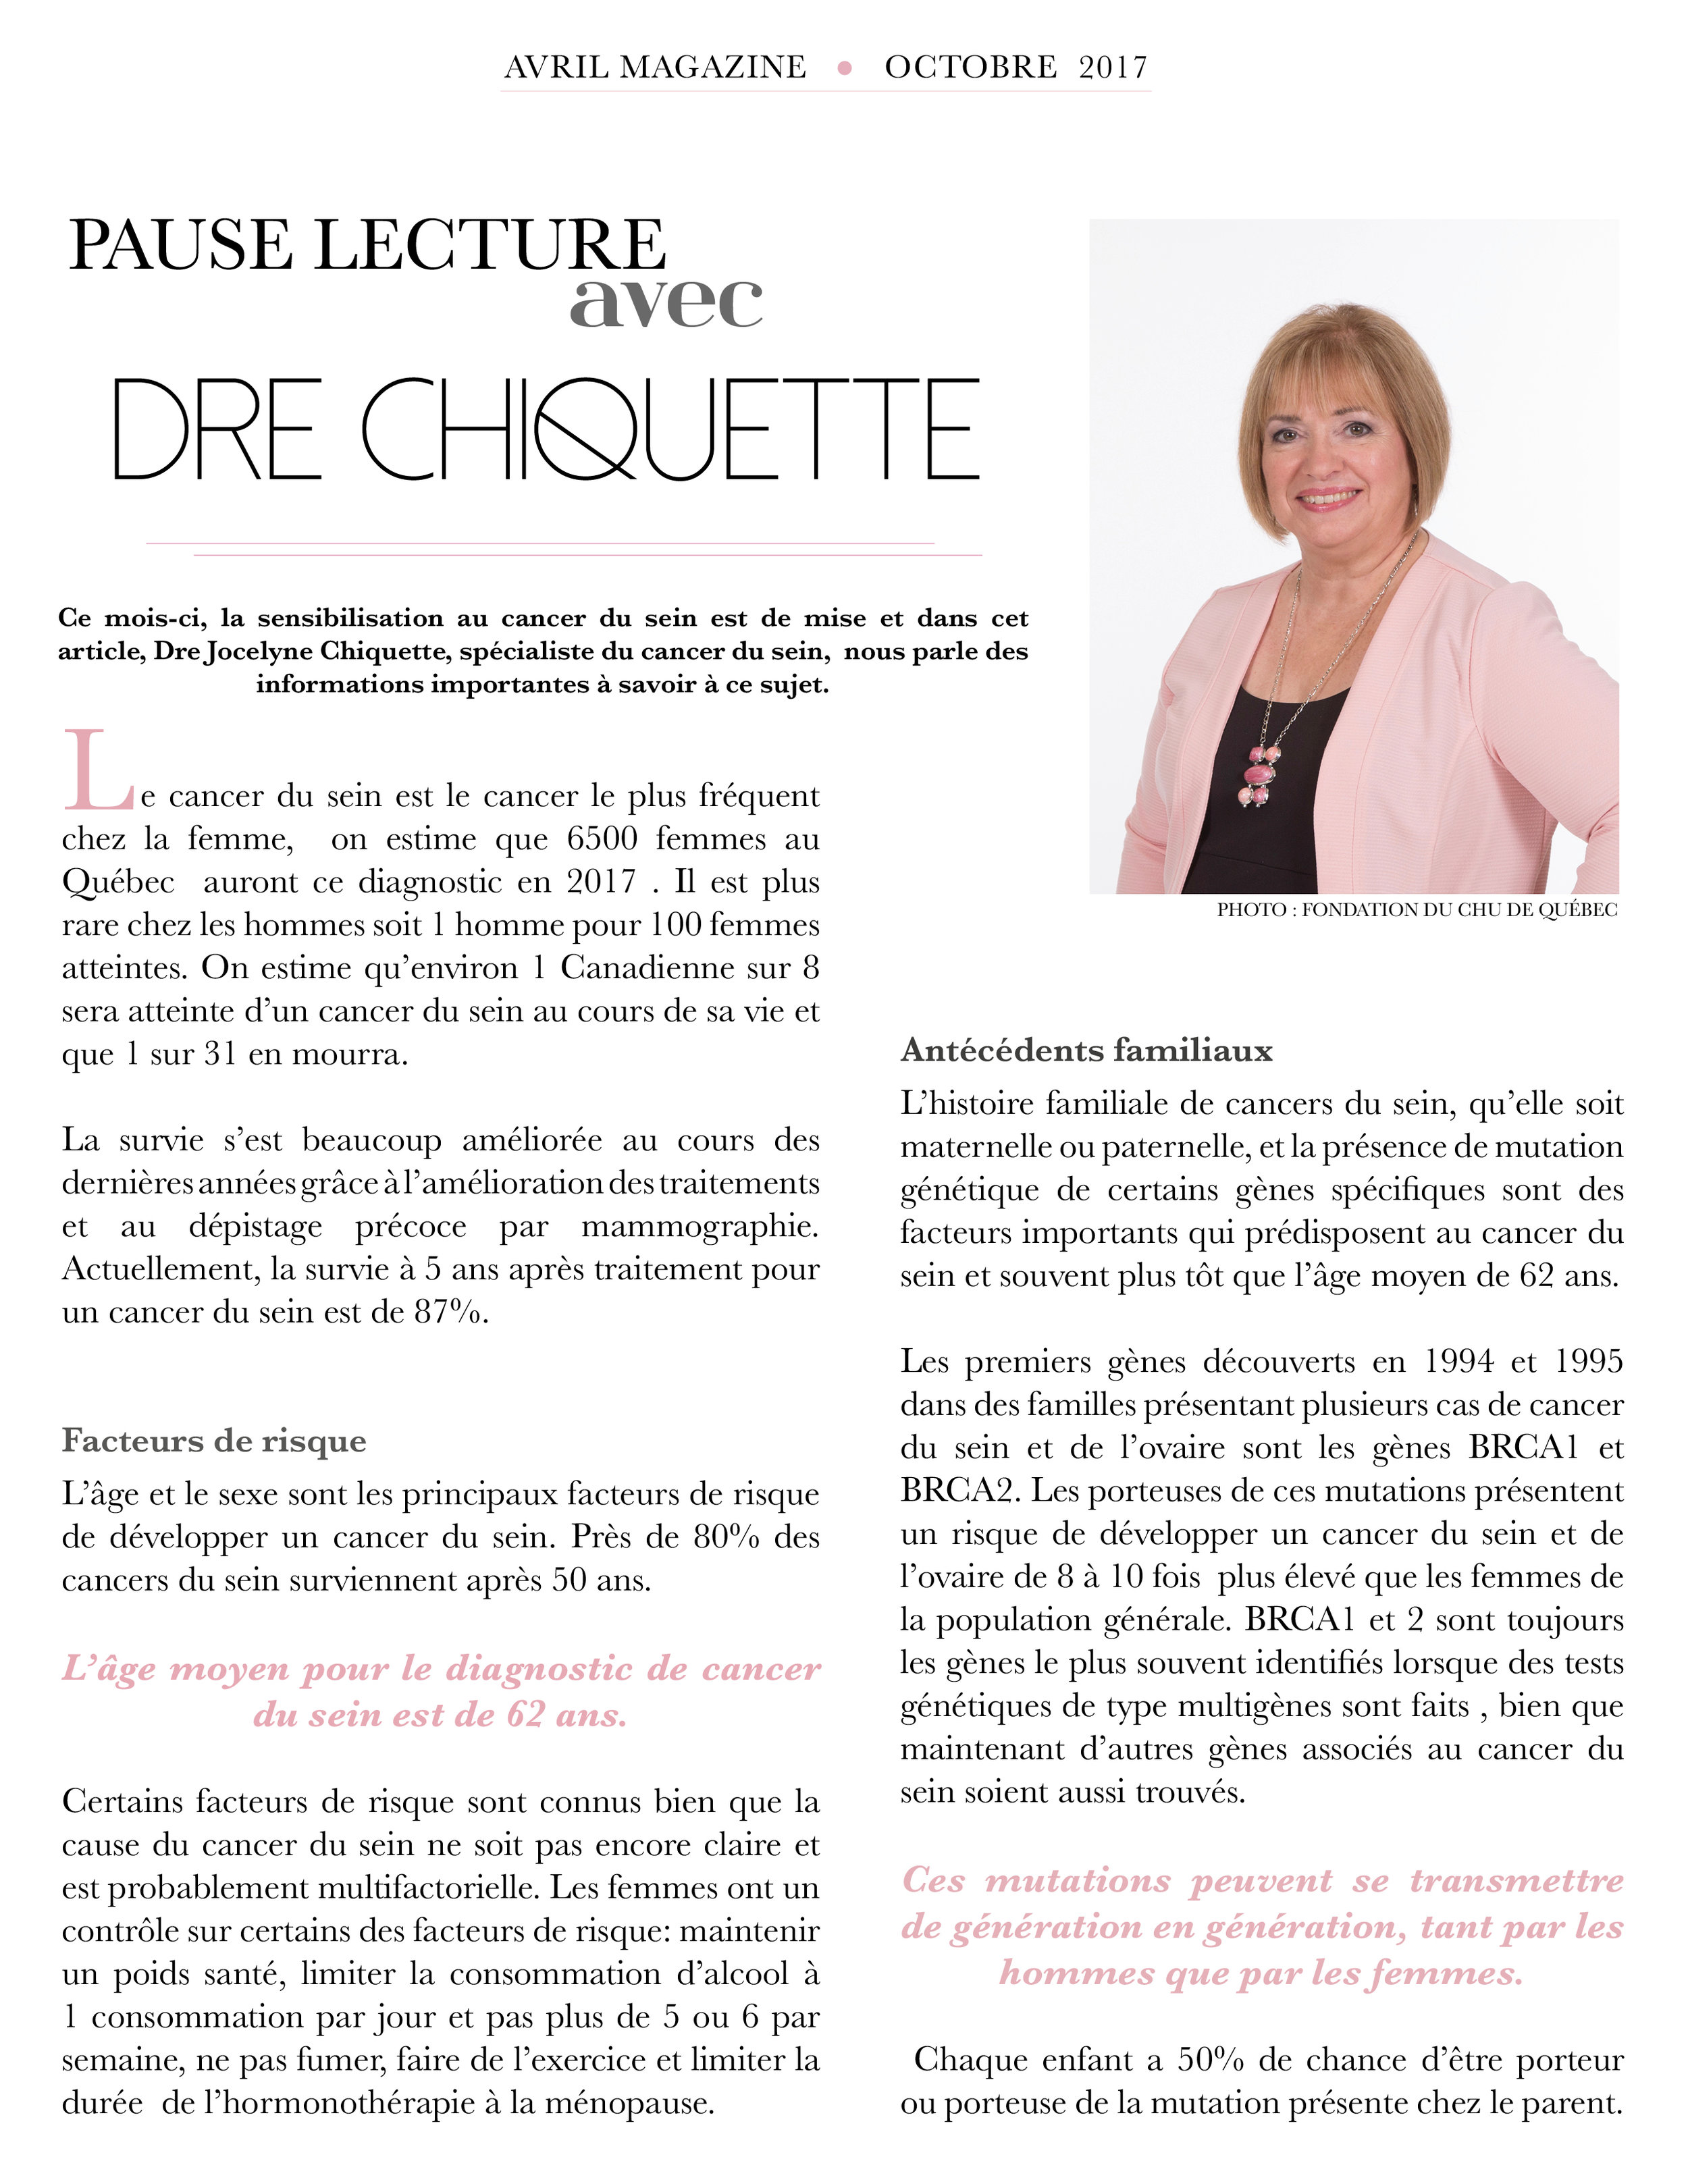 Article-Jocelyne-chiquette.jpg